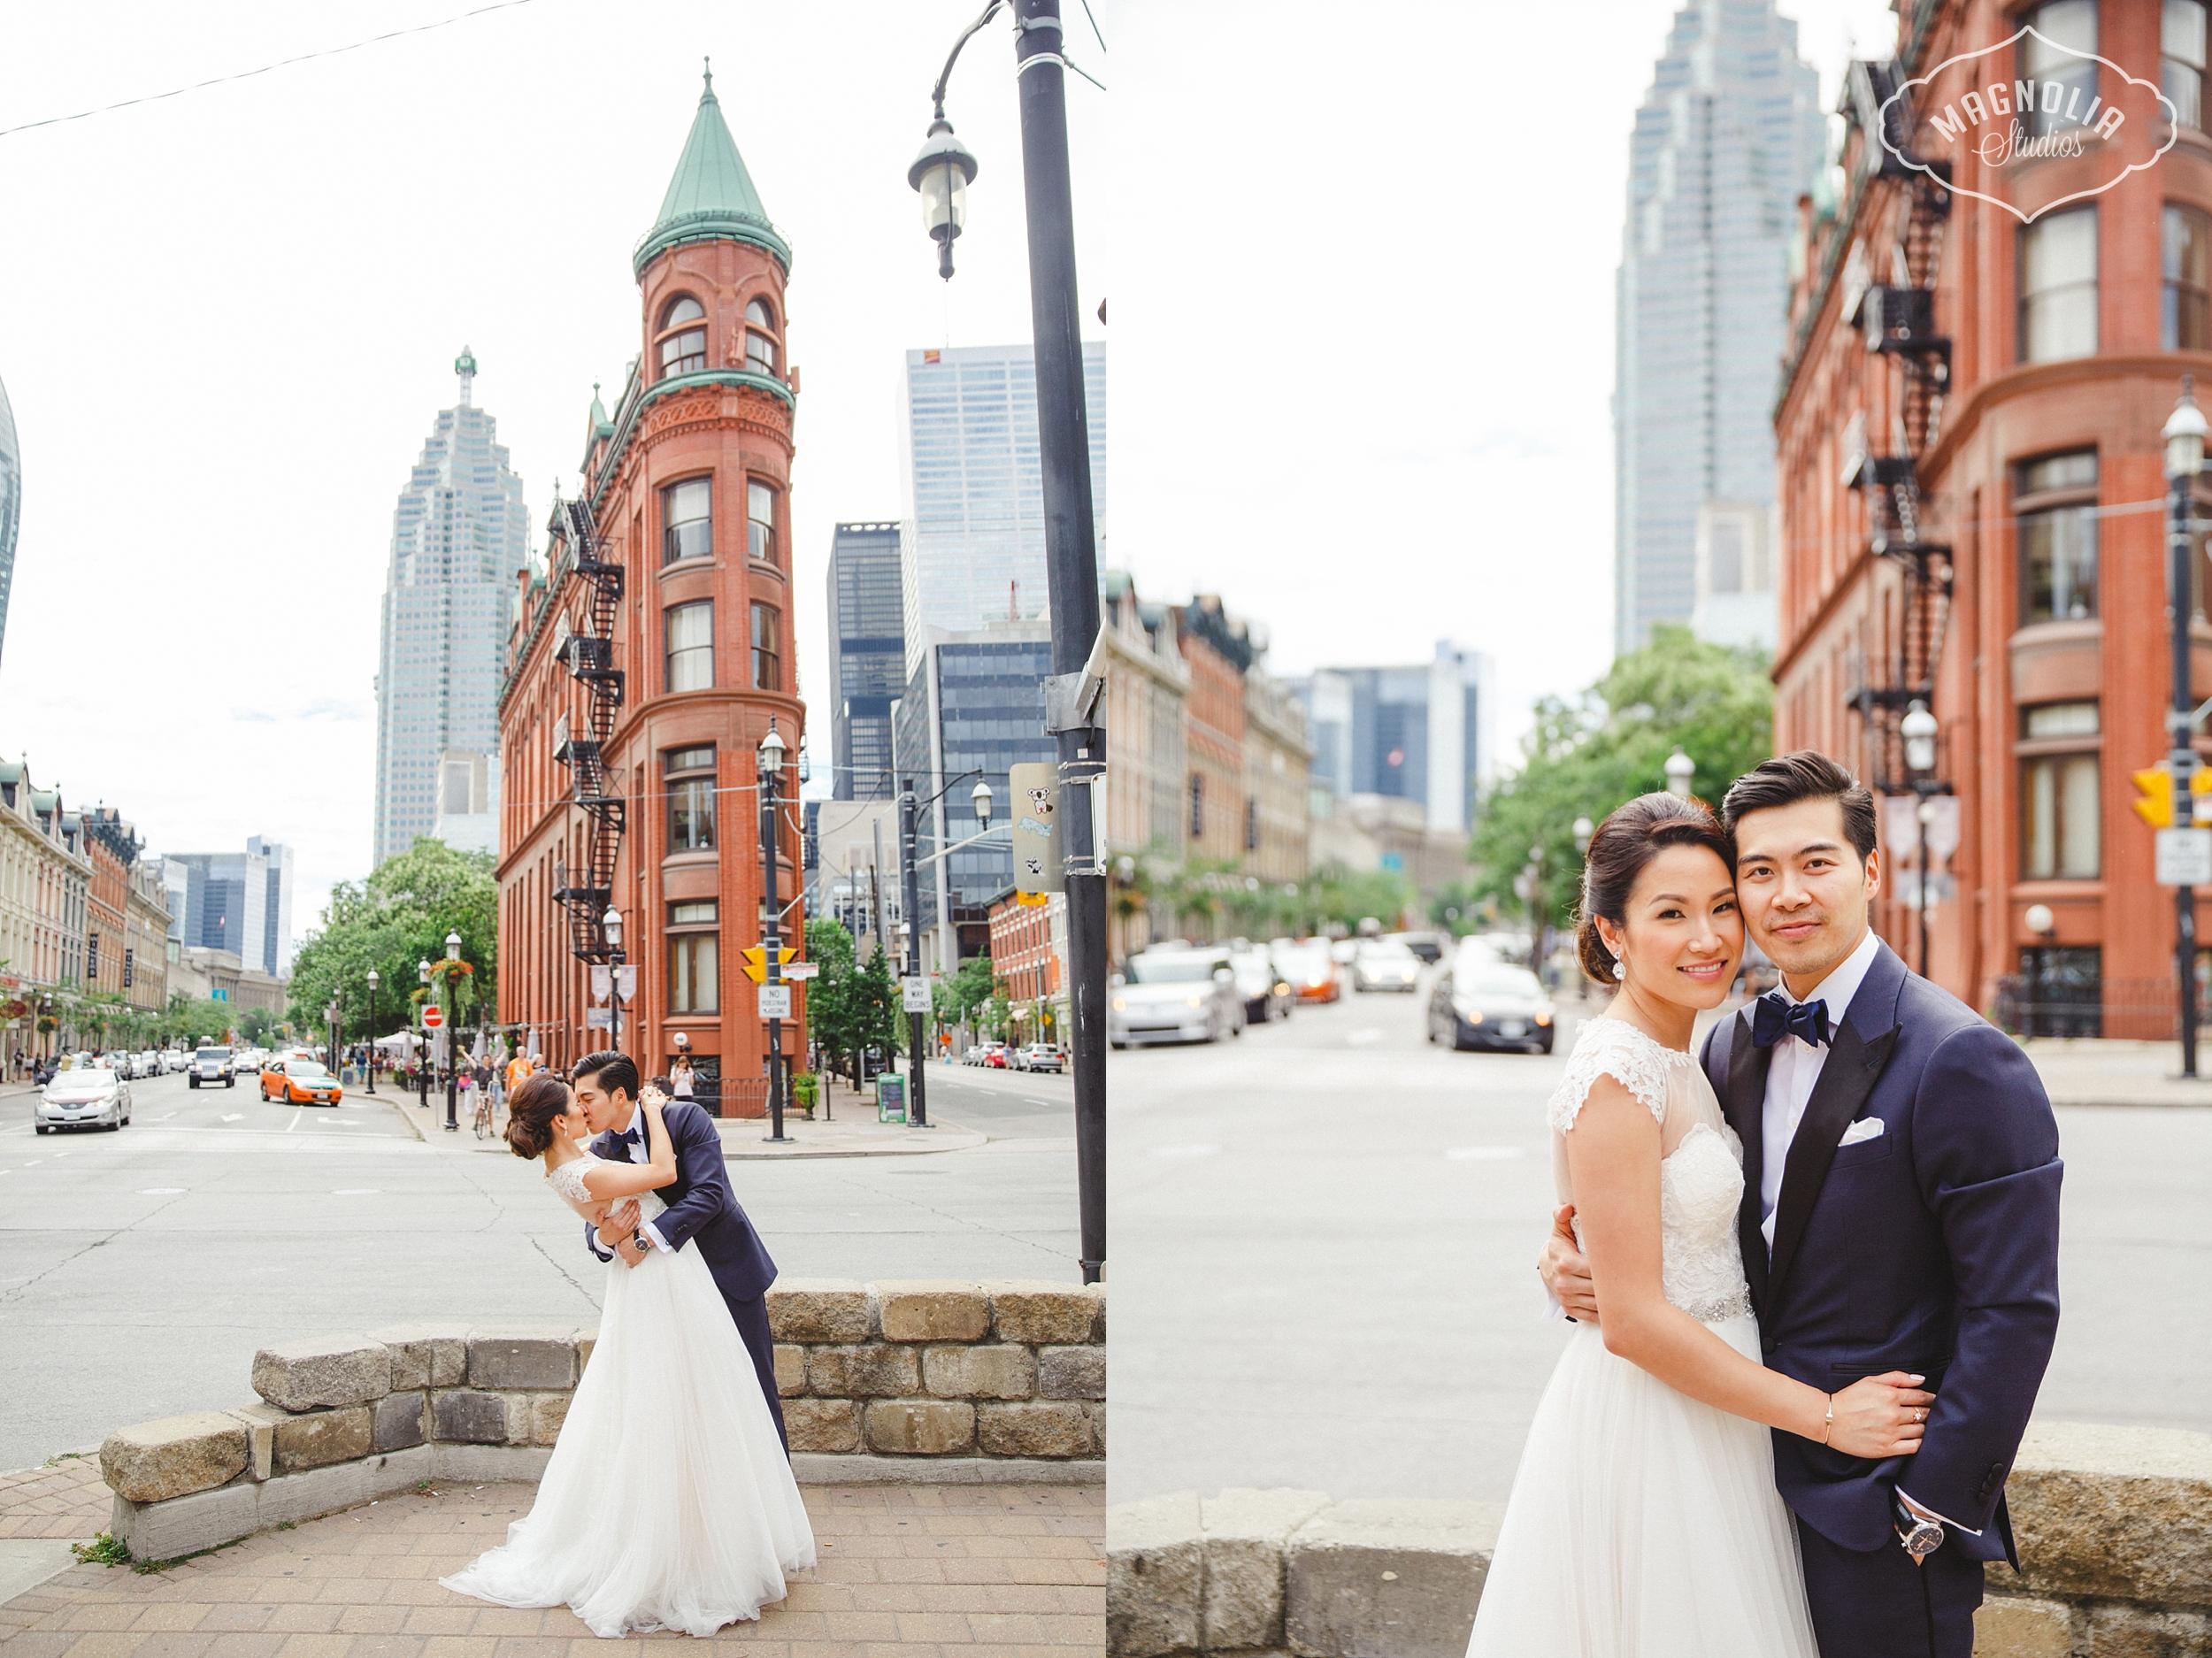 Professional Toronto Wedding Photography